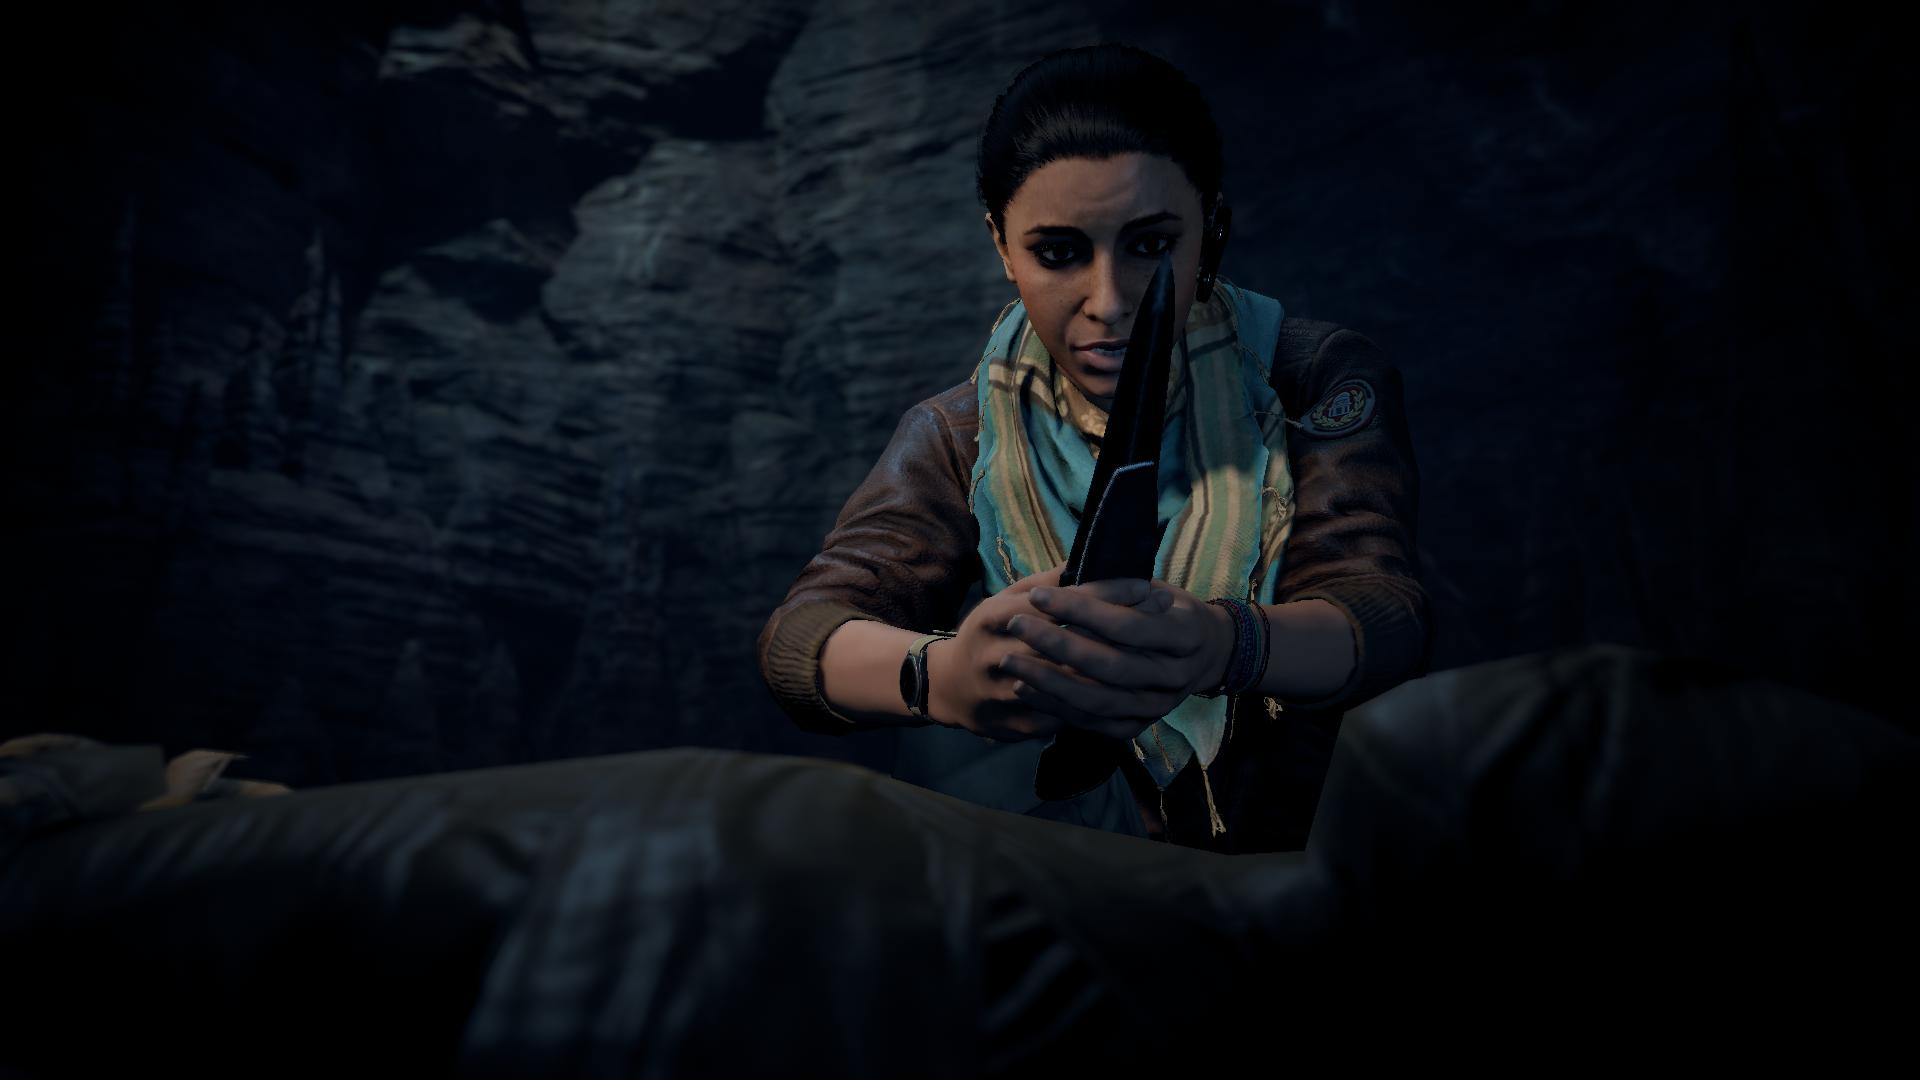 Assassin's Creed  Origins Screenshot 2019.05.25 - 16.35.26.99.png